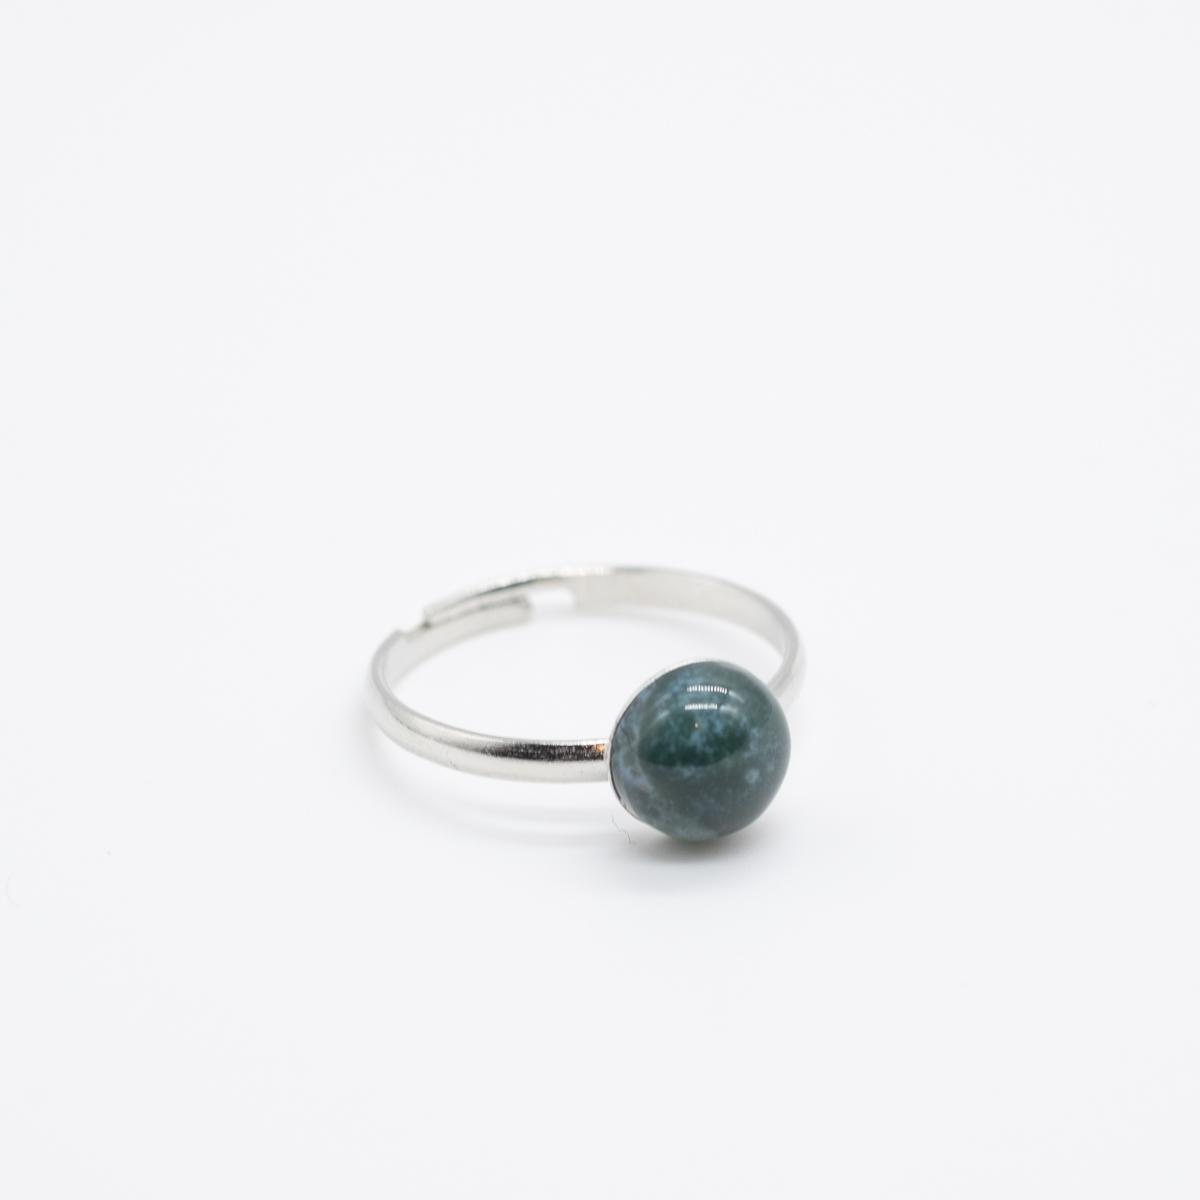 RNG-018 mosagaat ring zilver